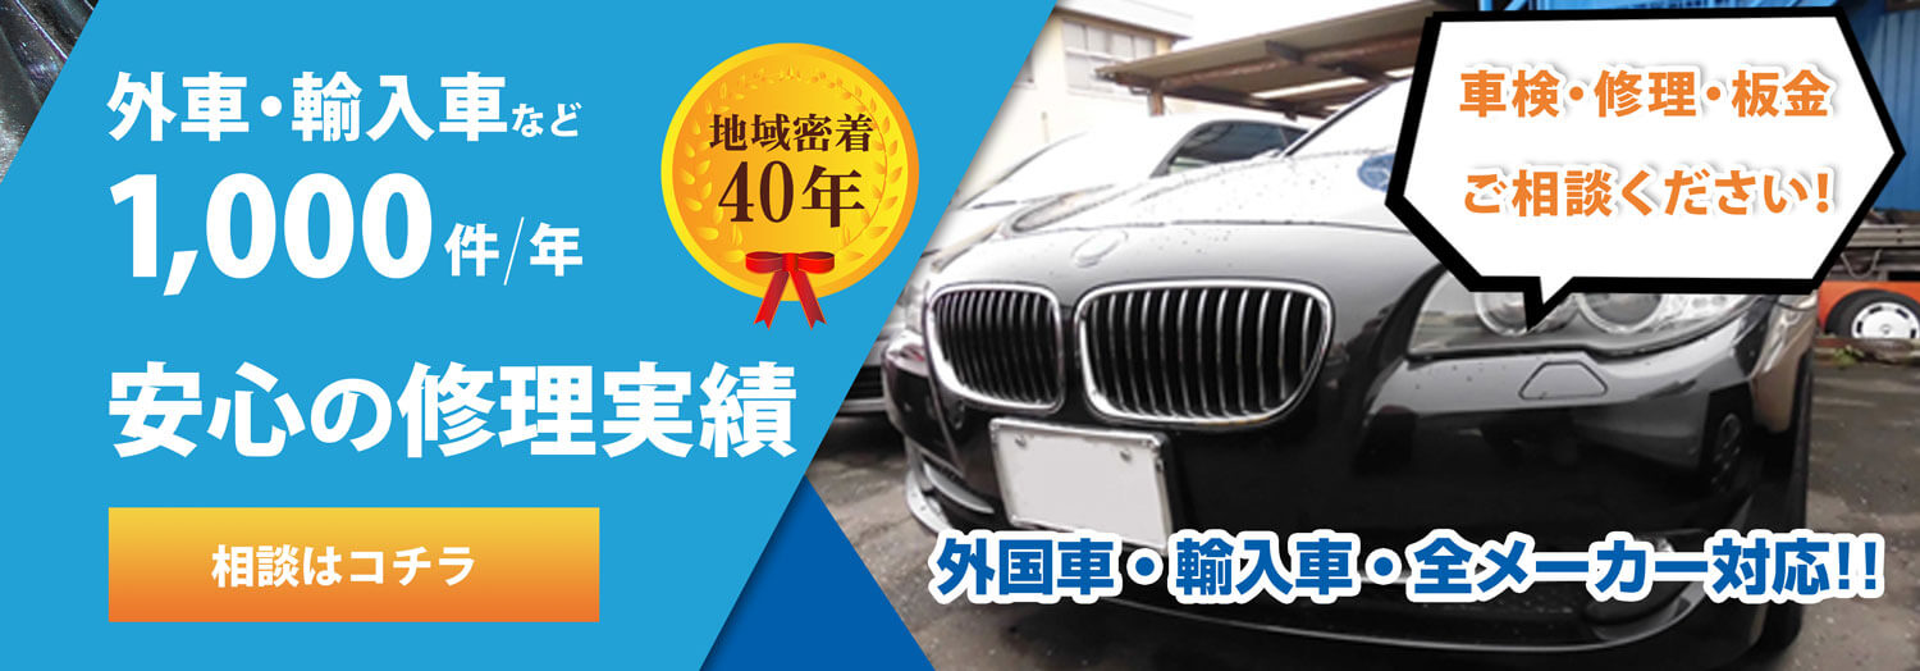 外車・輸入車含め1000件/年の修理実績